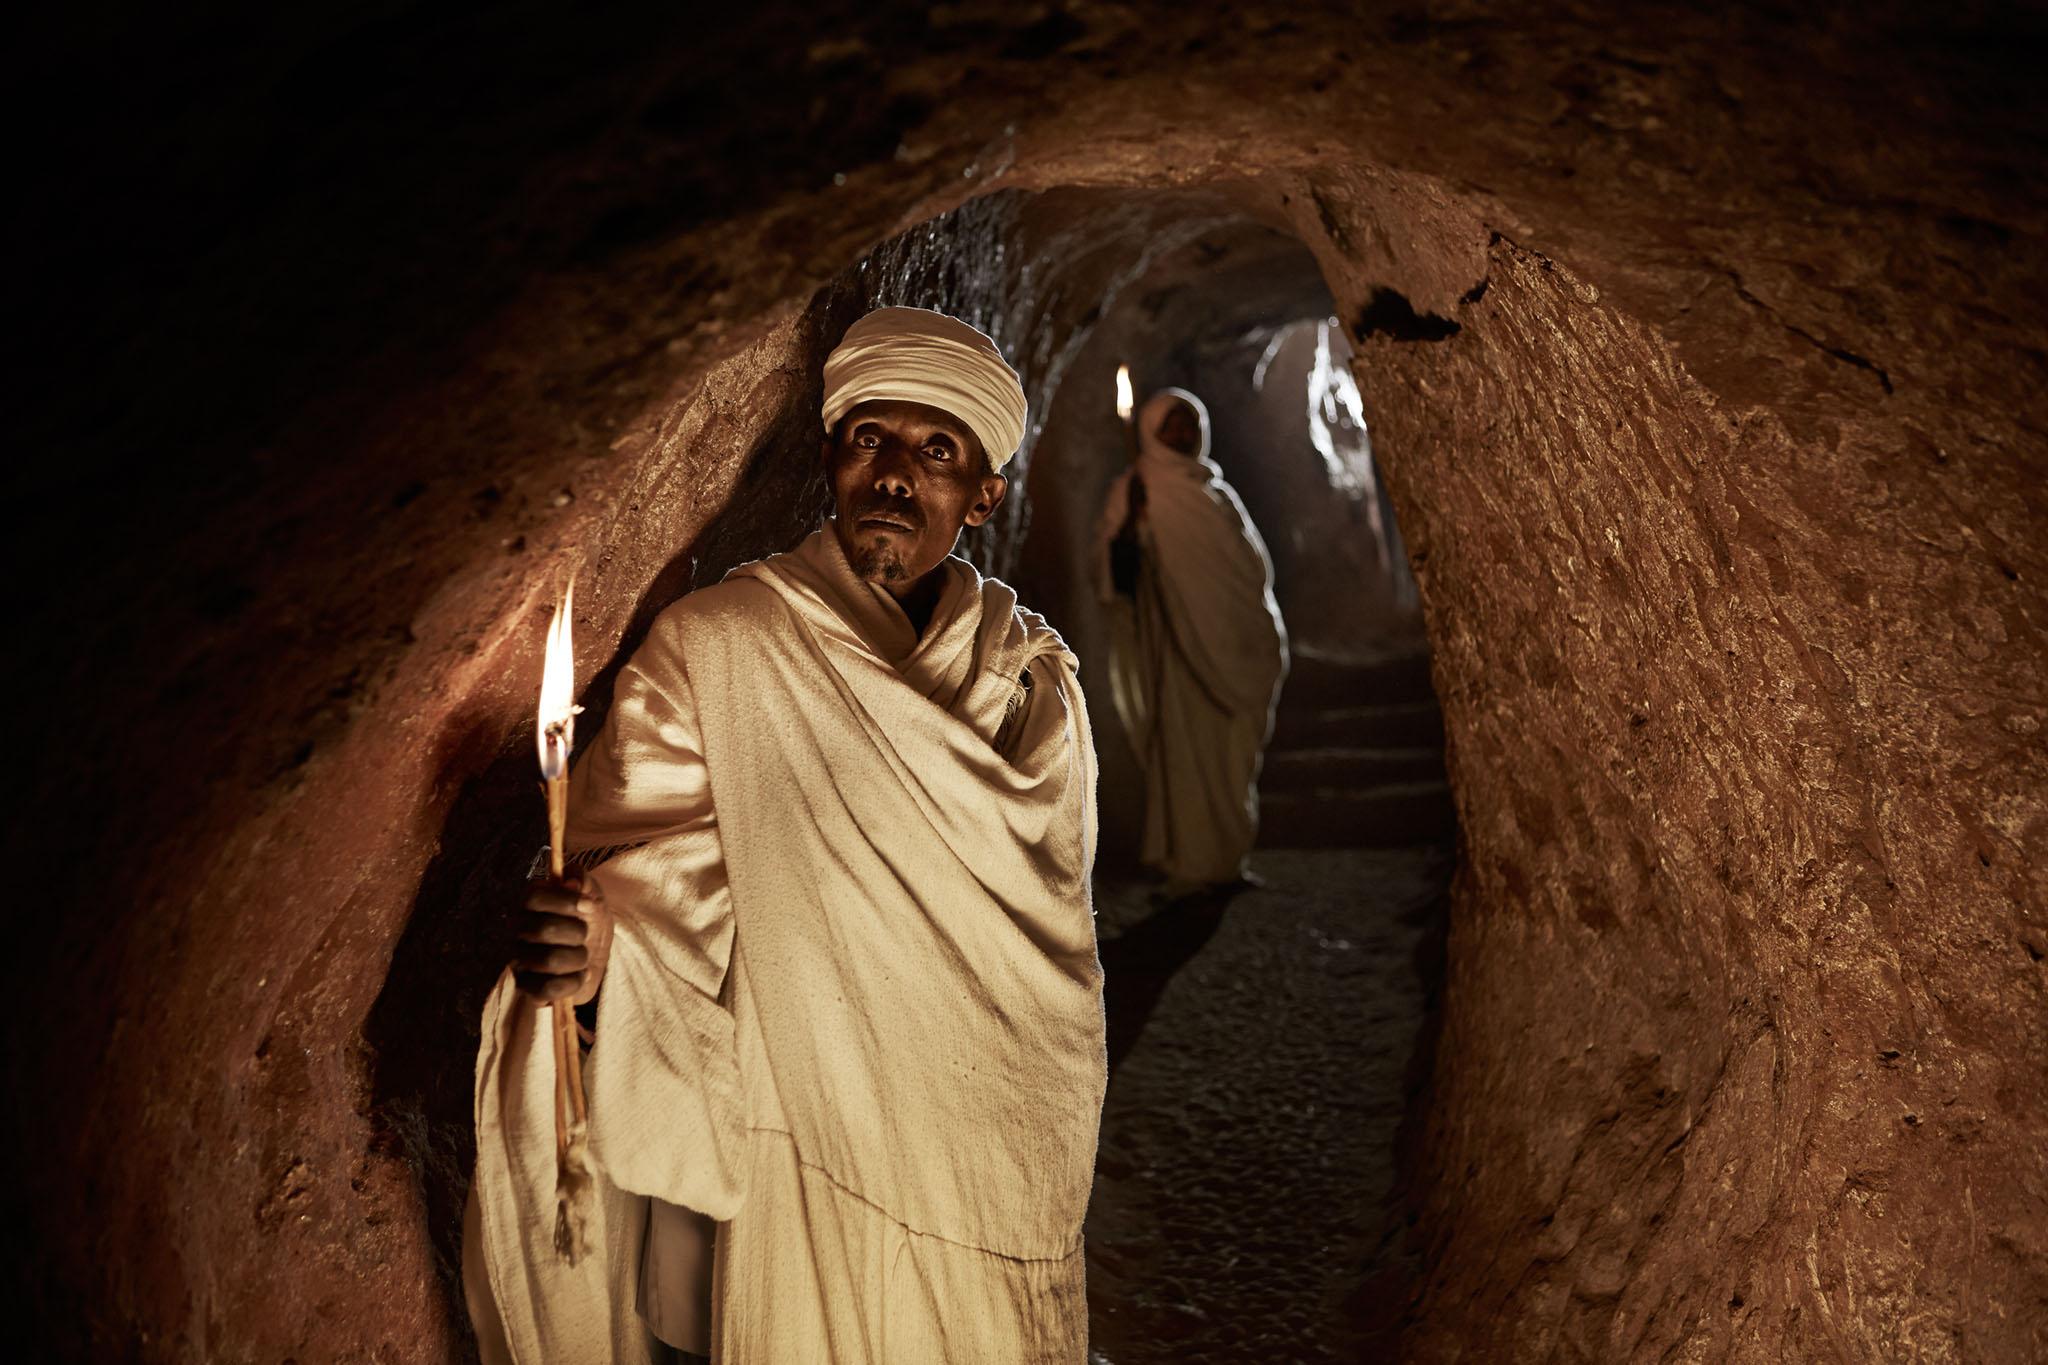 [Image: Joey_L_Photographer_Northern_Ethiopia_Holy_Men_023.jpg]